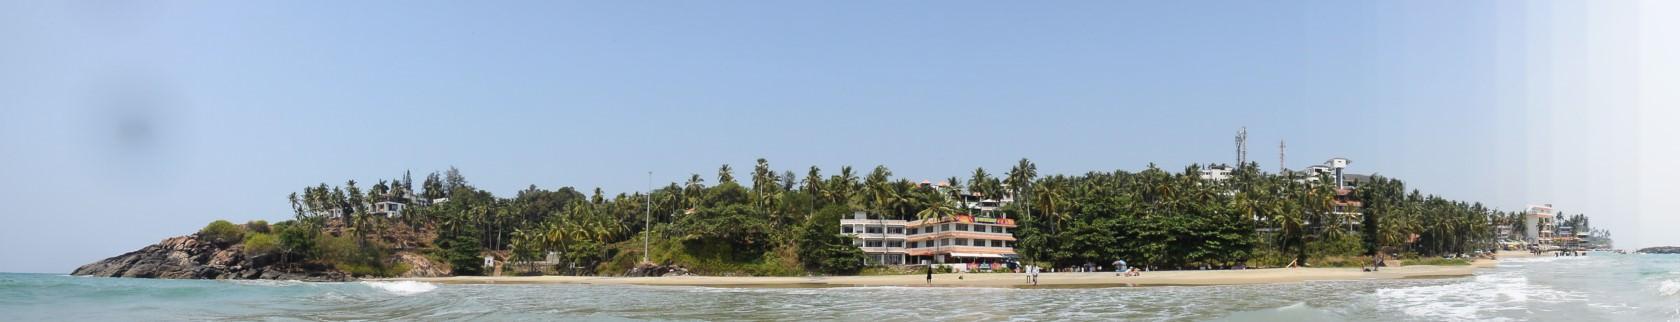 Kovalam Kerala India (2)